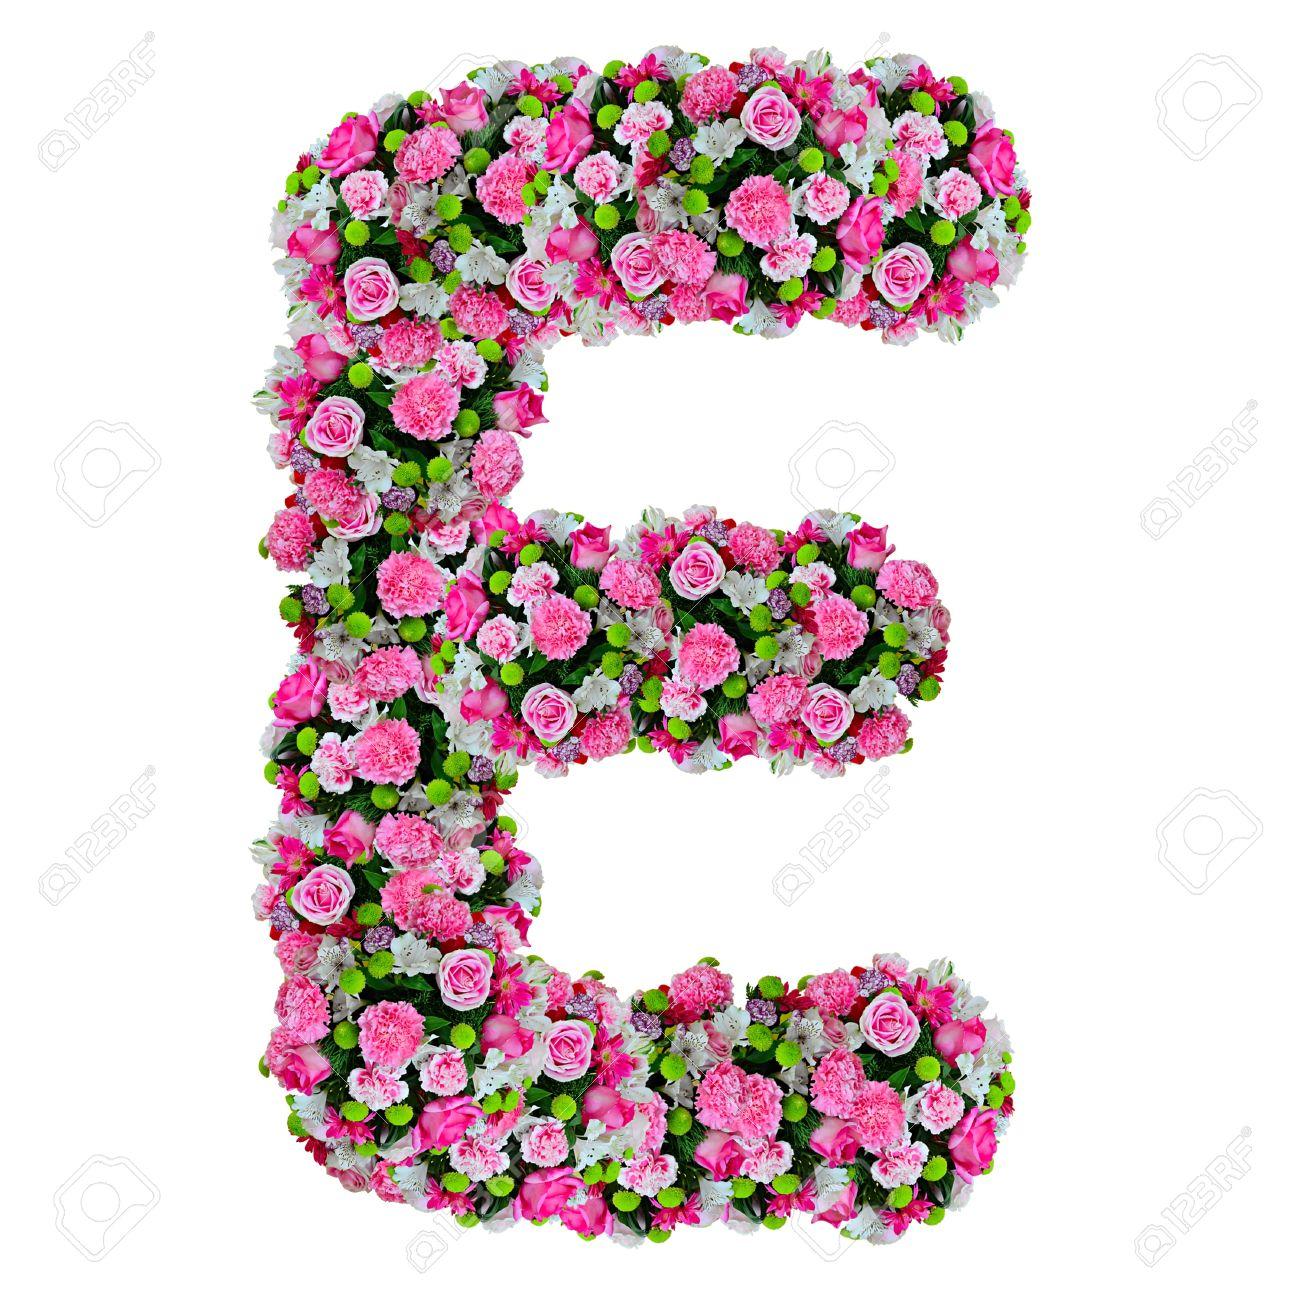 E flower alphabet isolated on white with clipping path stock photo e flower alphabet isolated on white with clipping path stock photo 11854419 thecheapjerseys Choice Image